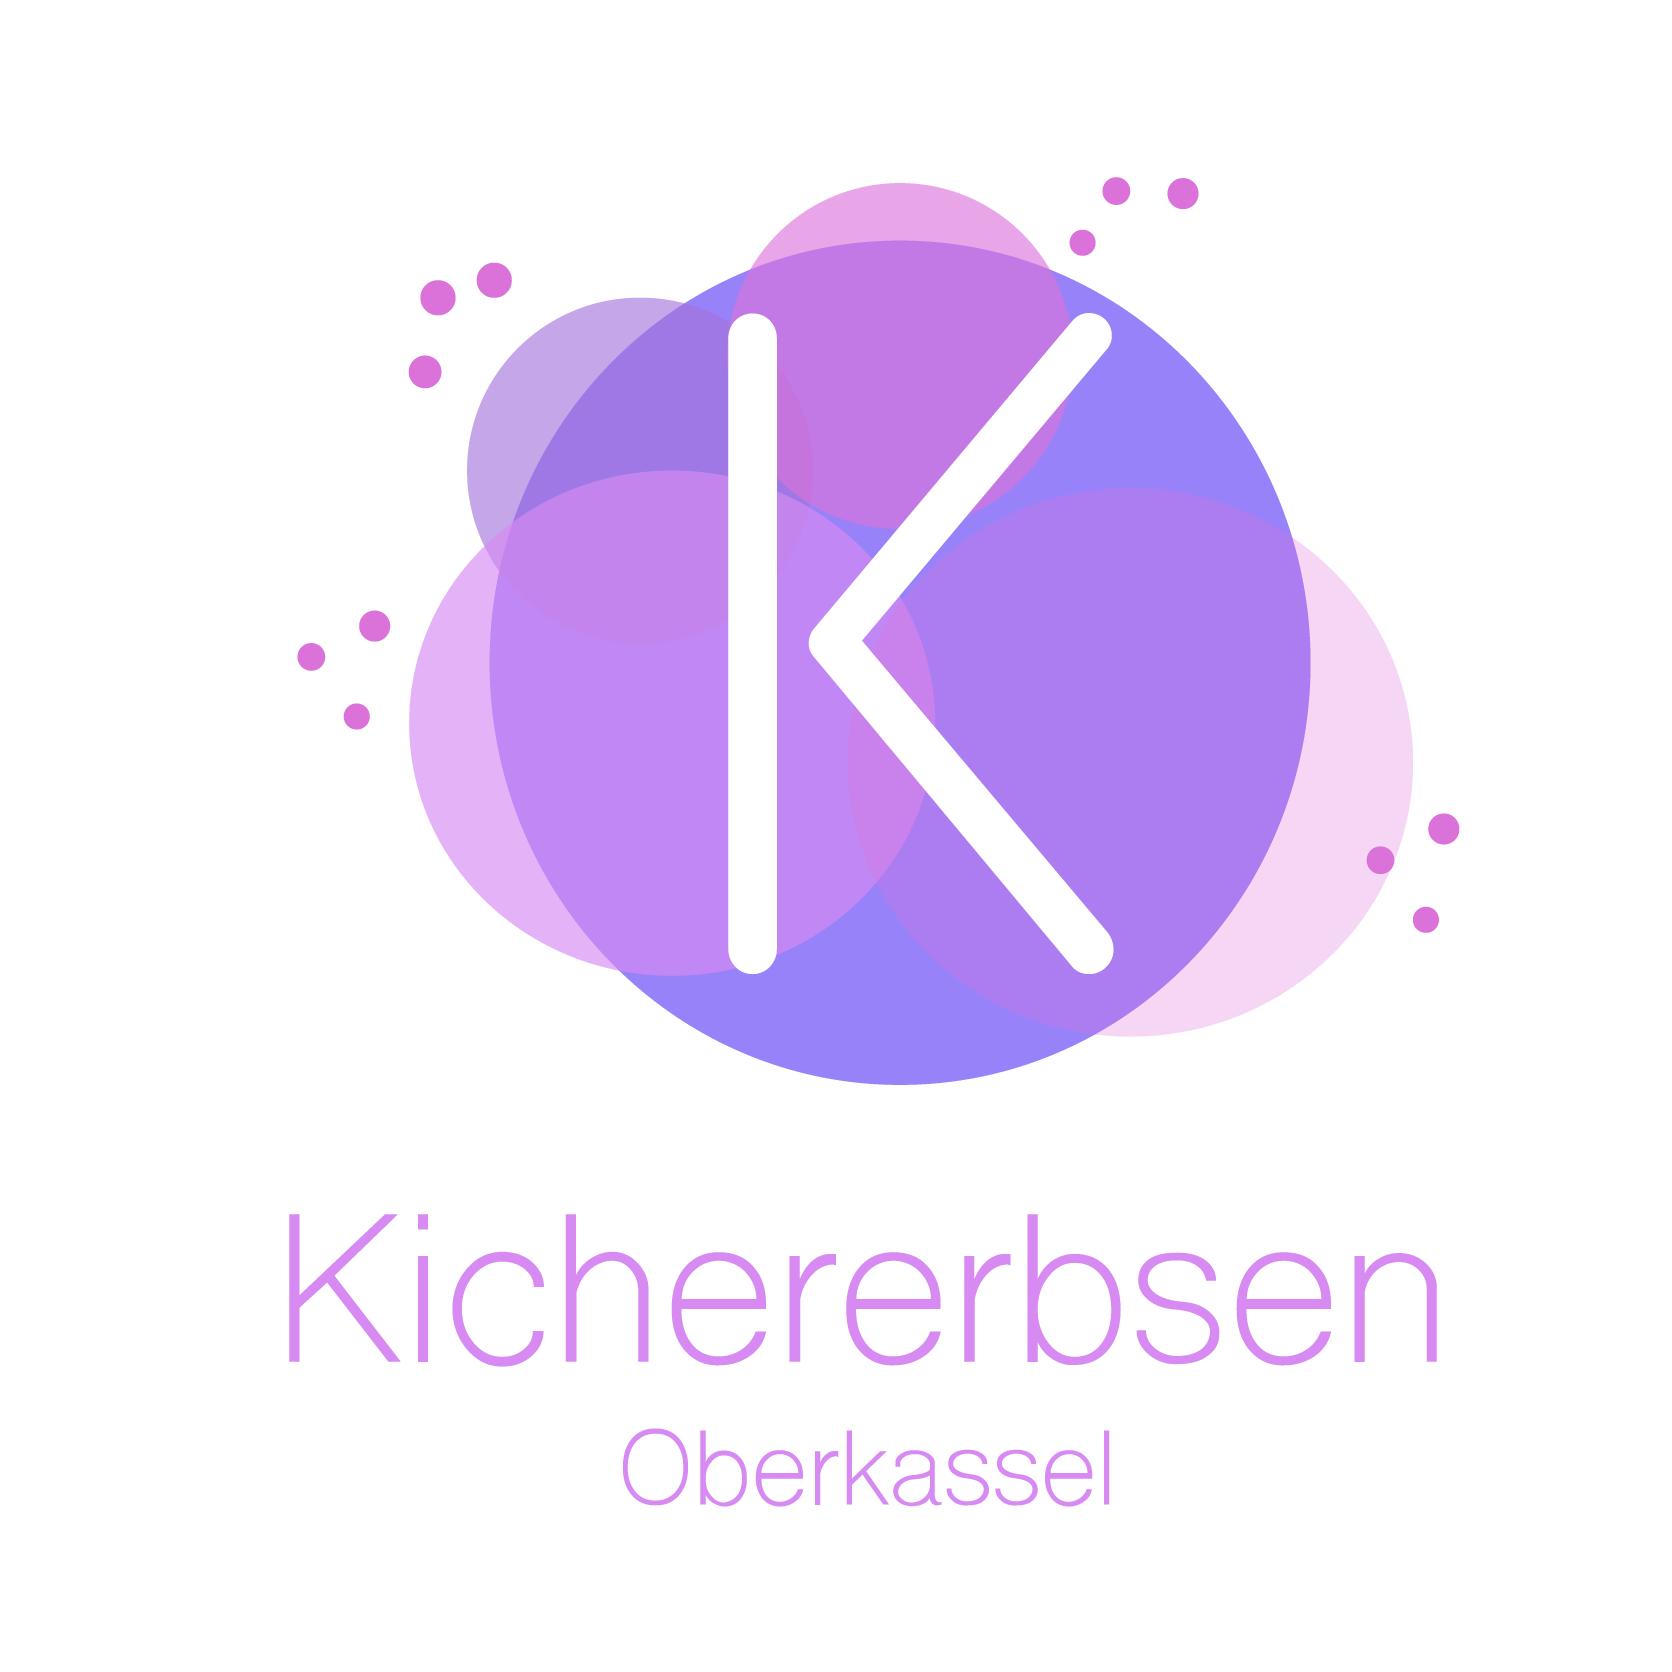 logo design kichererbsen oberkassel das mechanische auge düsseldorf